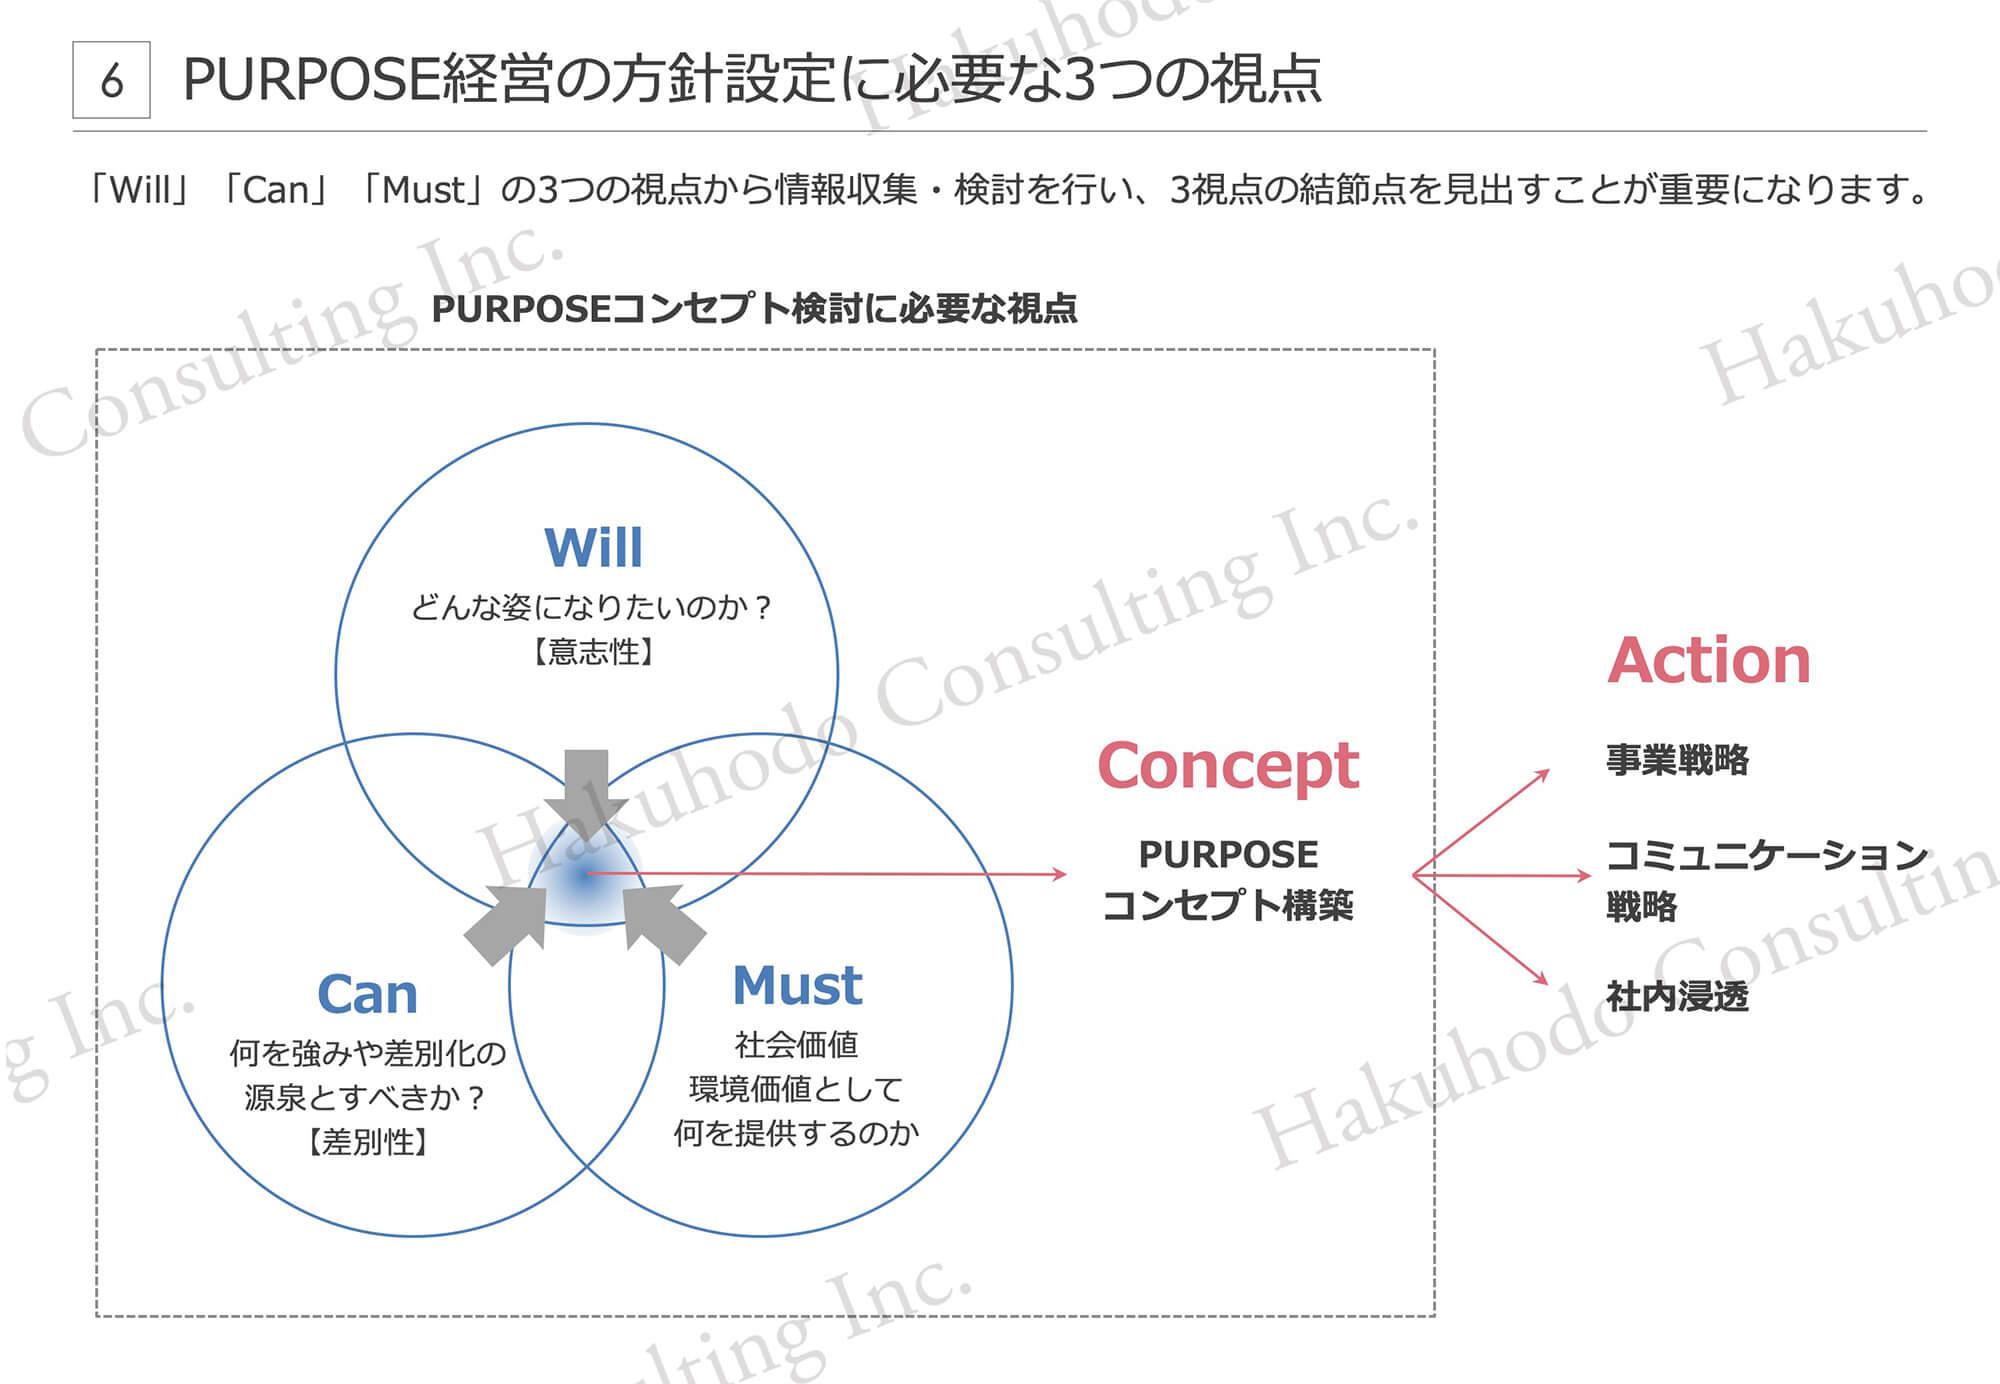 PURPOSE経営の方針設定に必要な3つの視点6「Will」「Can」「Must」の3つの視点から情報収集・検討を行い、3視点の結節点を見出すことが重要になります。